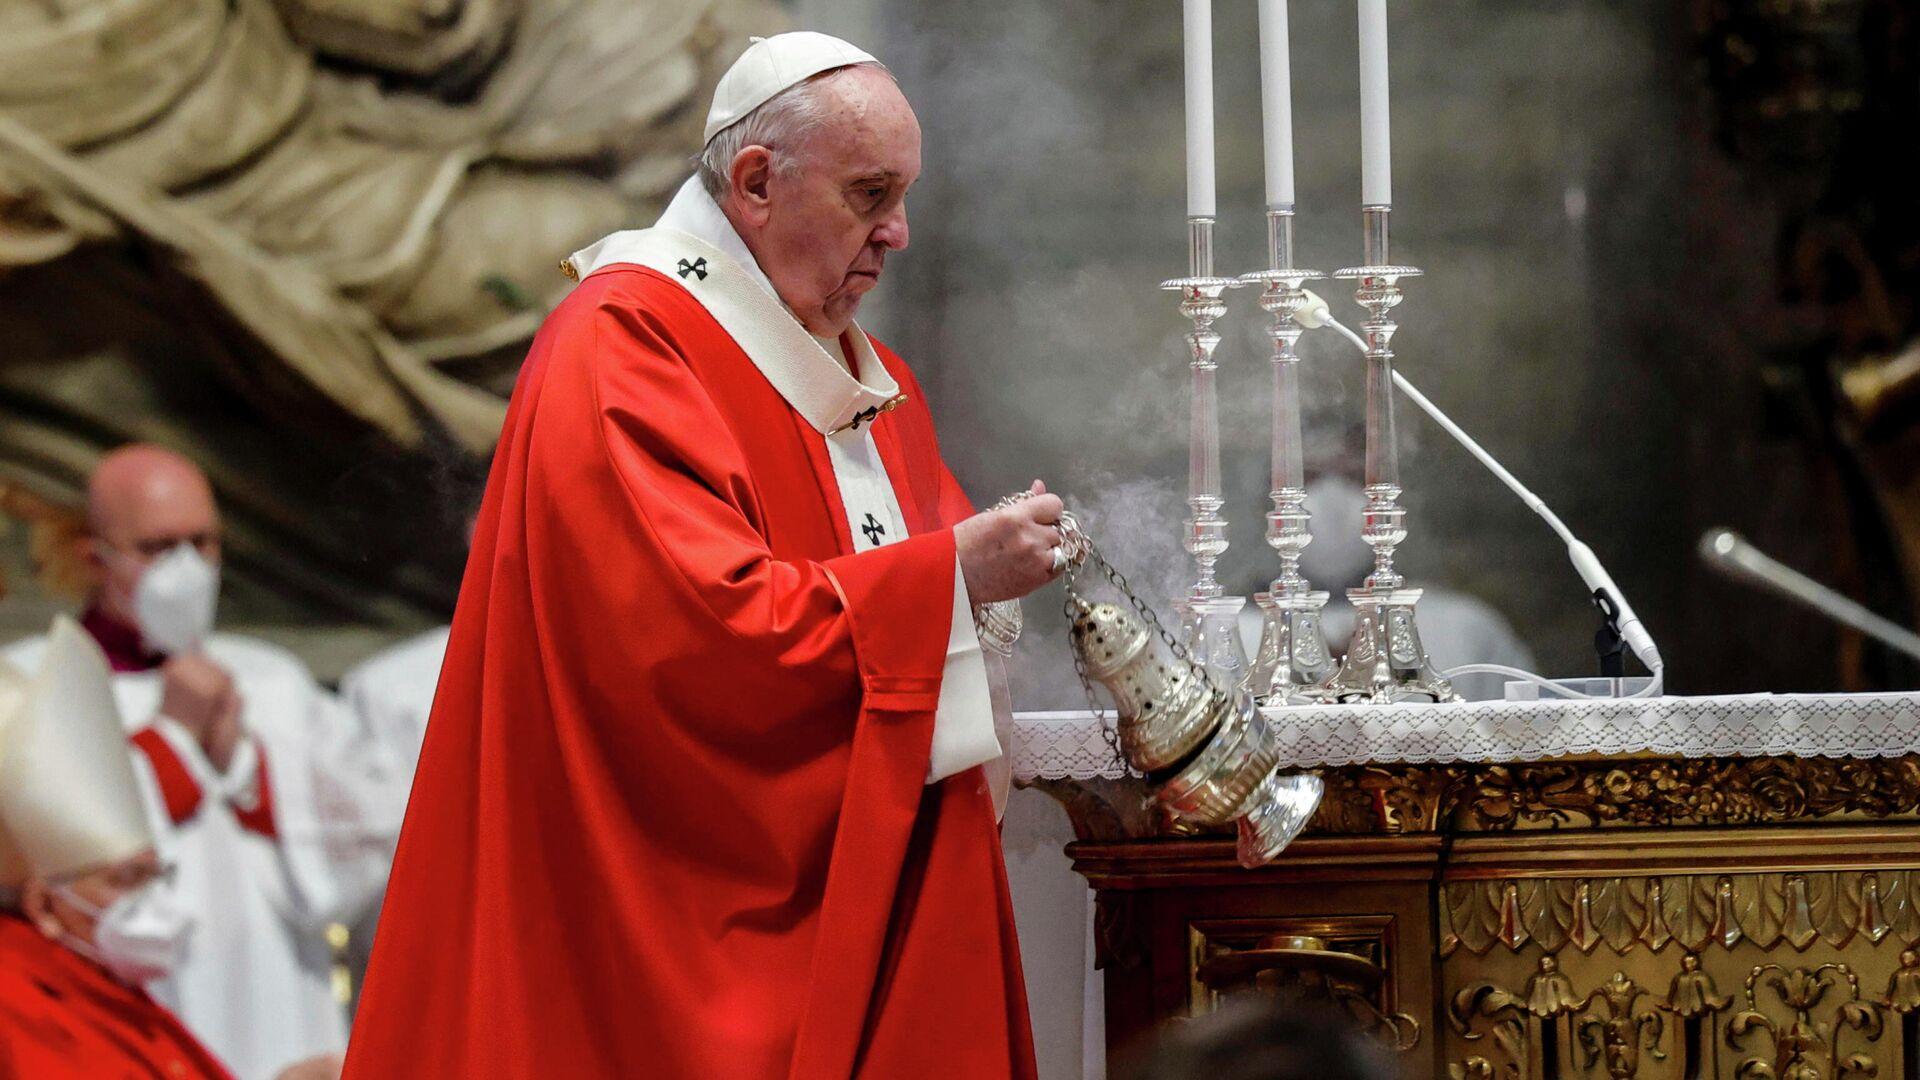 El papa Francisco - Sputnik Mundo, 1920, 29.03.2021